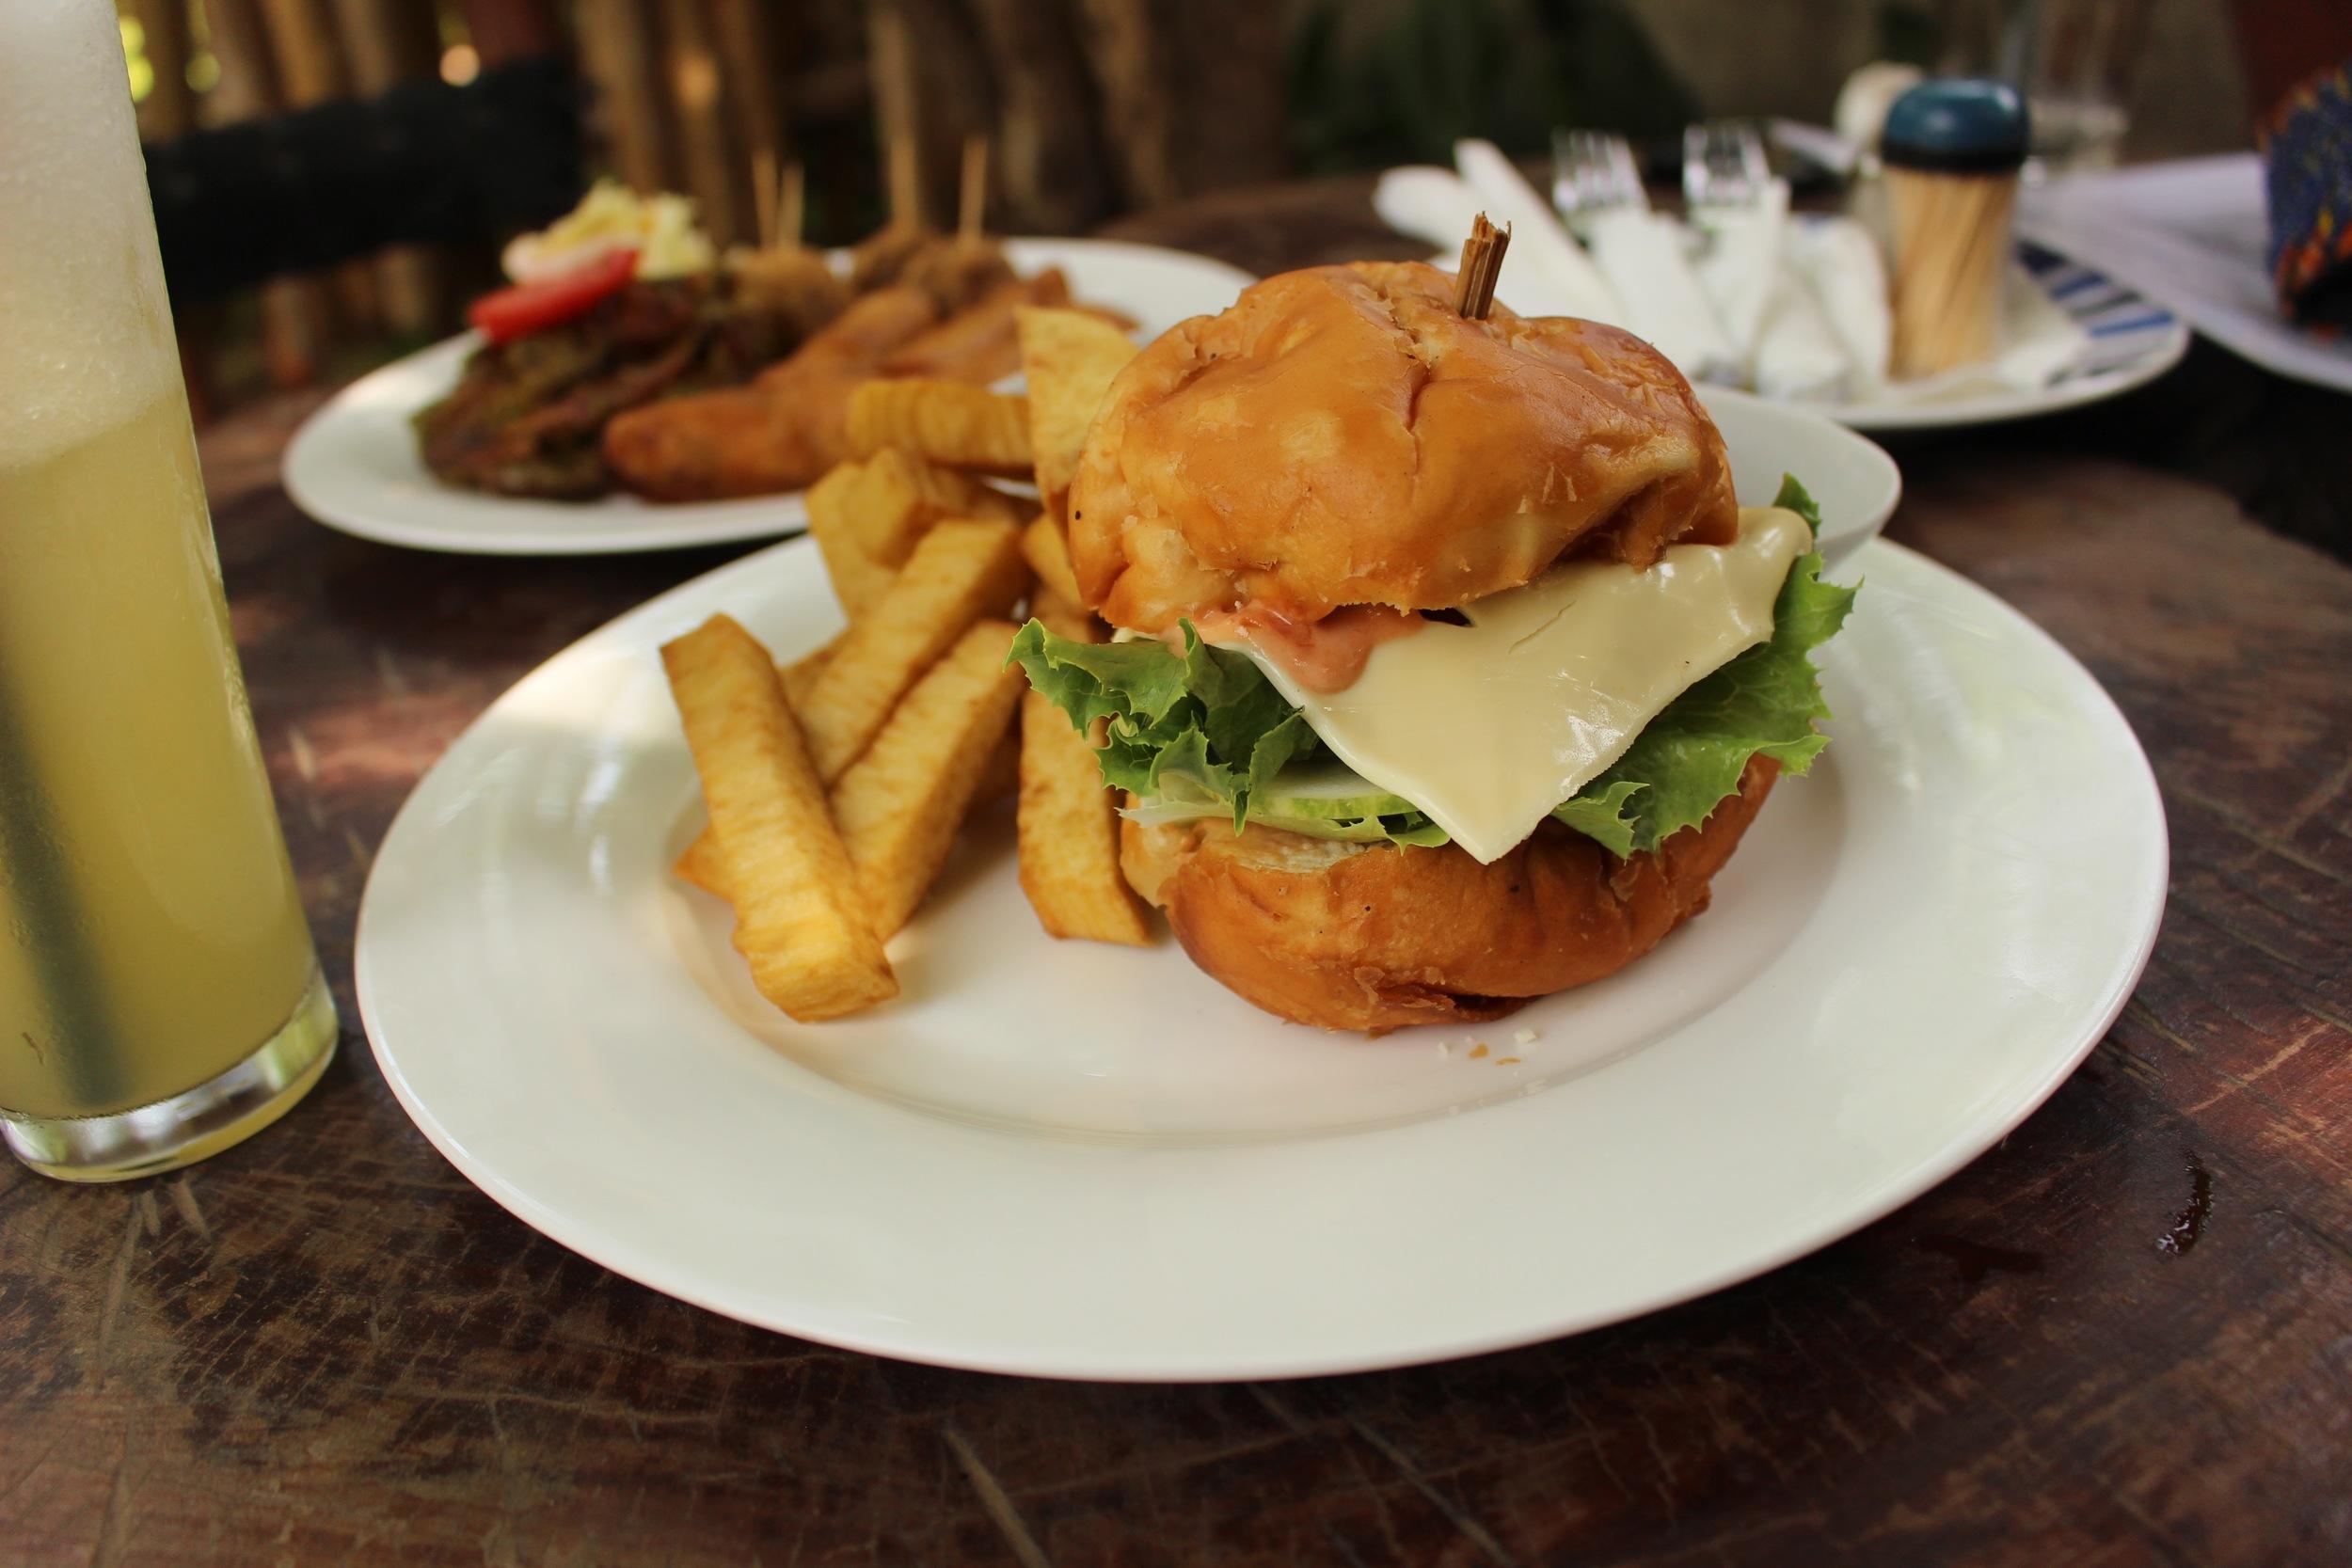 The Bofloat Burger, One Corner